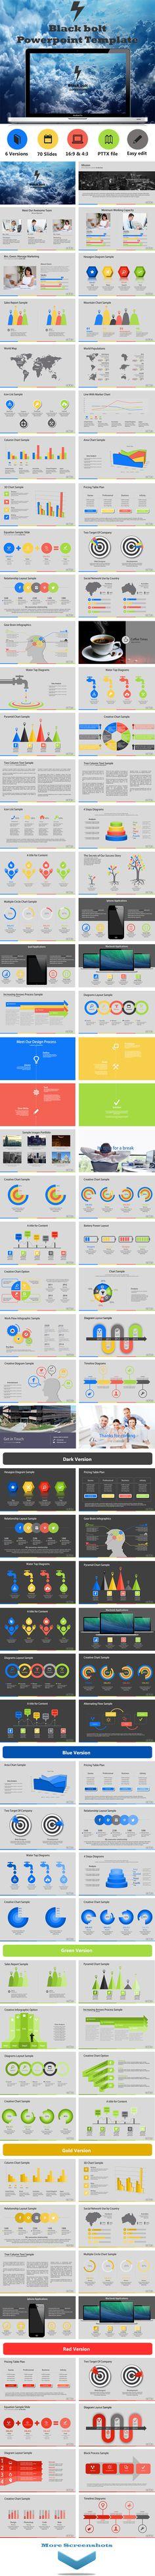 Blackbolt Powerpoint Template (PowerPoint Templates) Preview #Powerpoint #Powerpoint_Template #Presentation